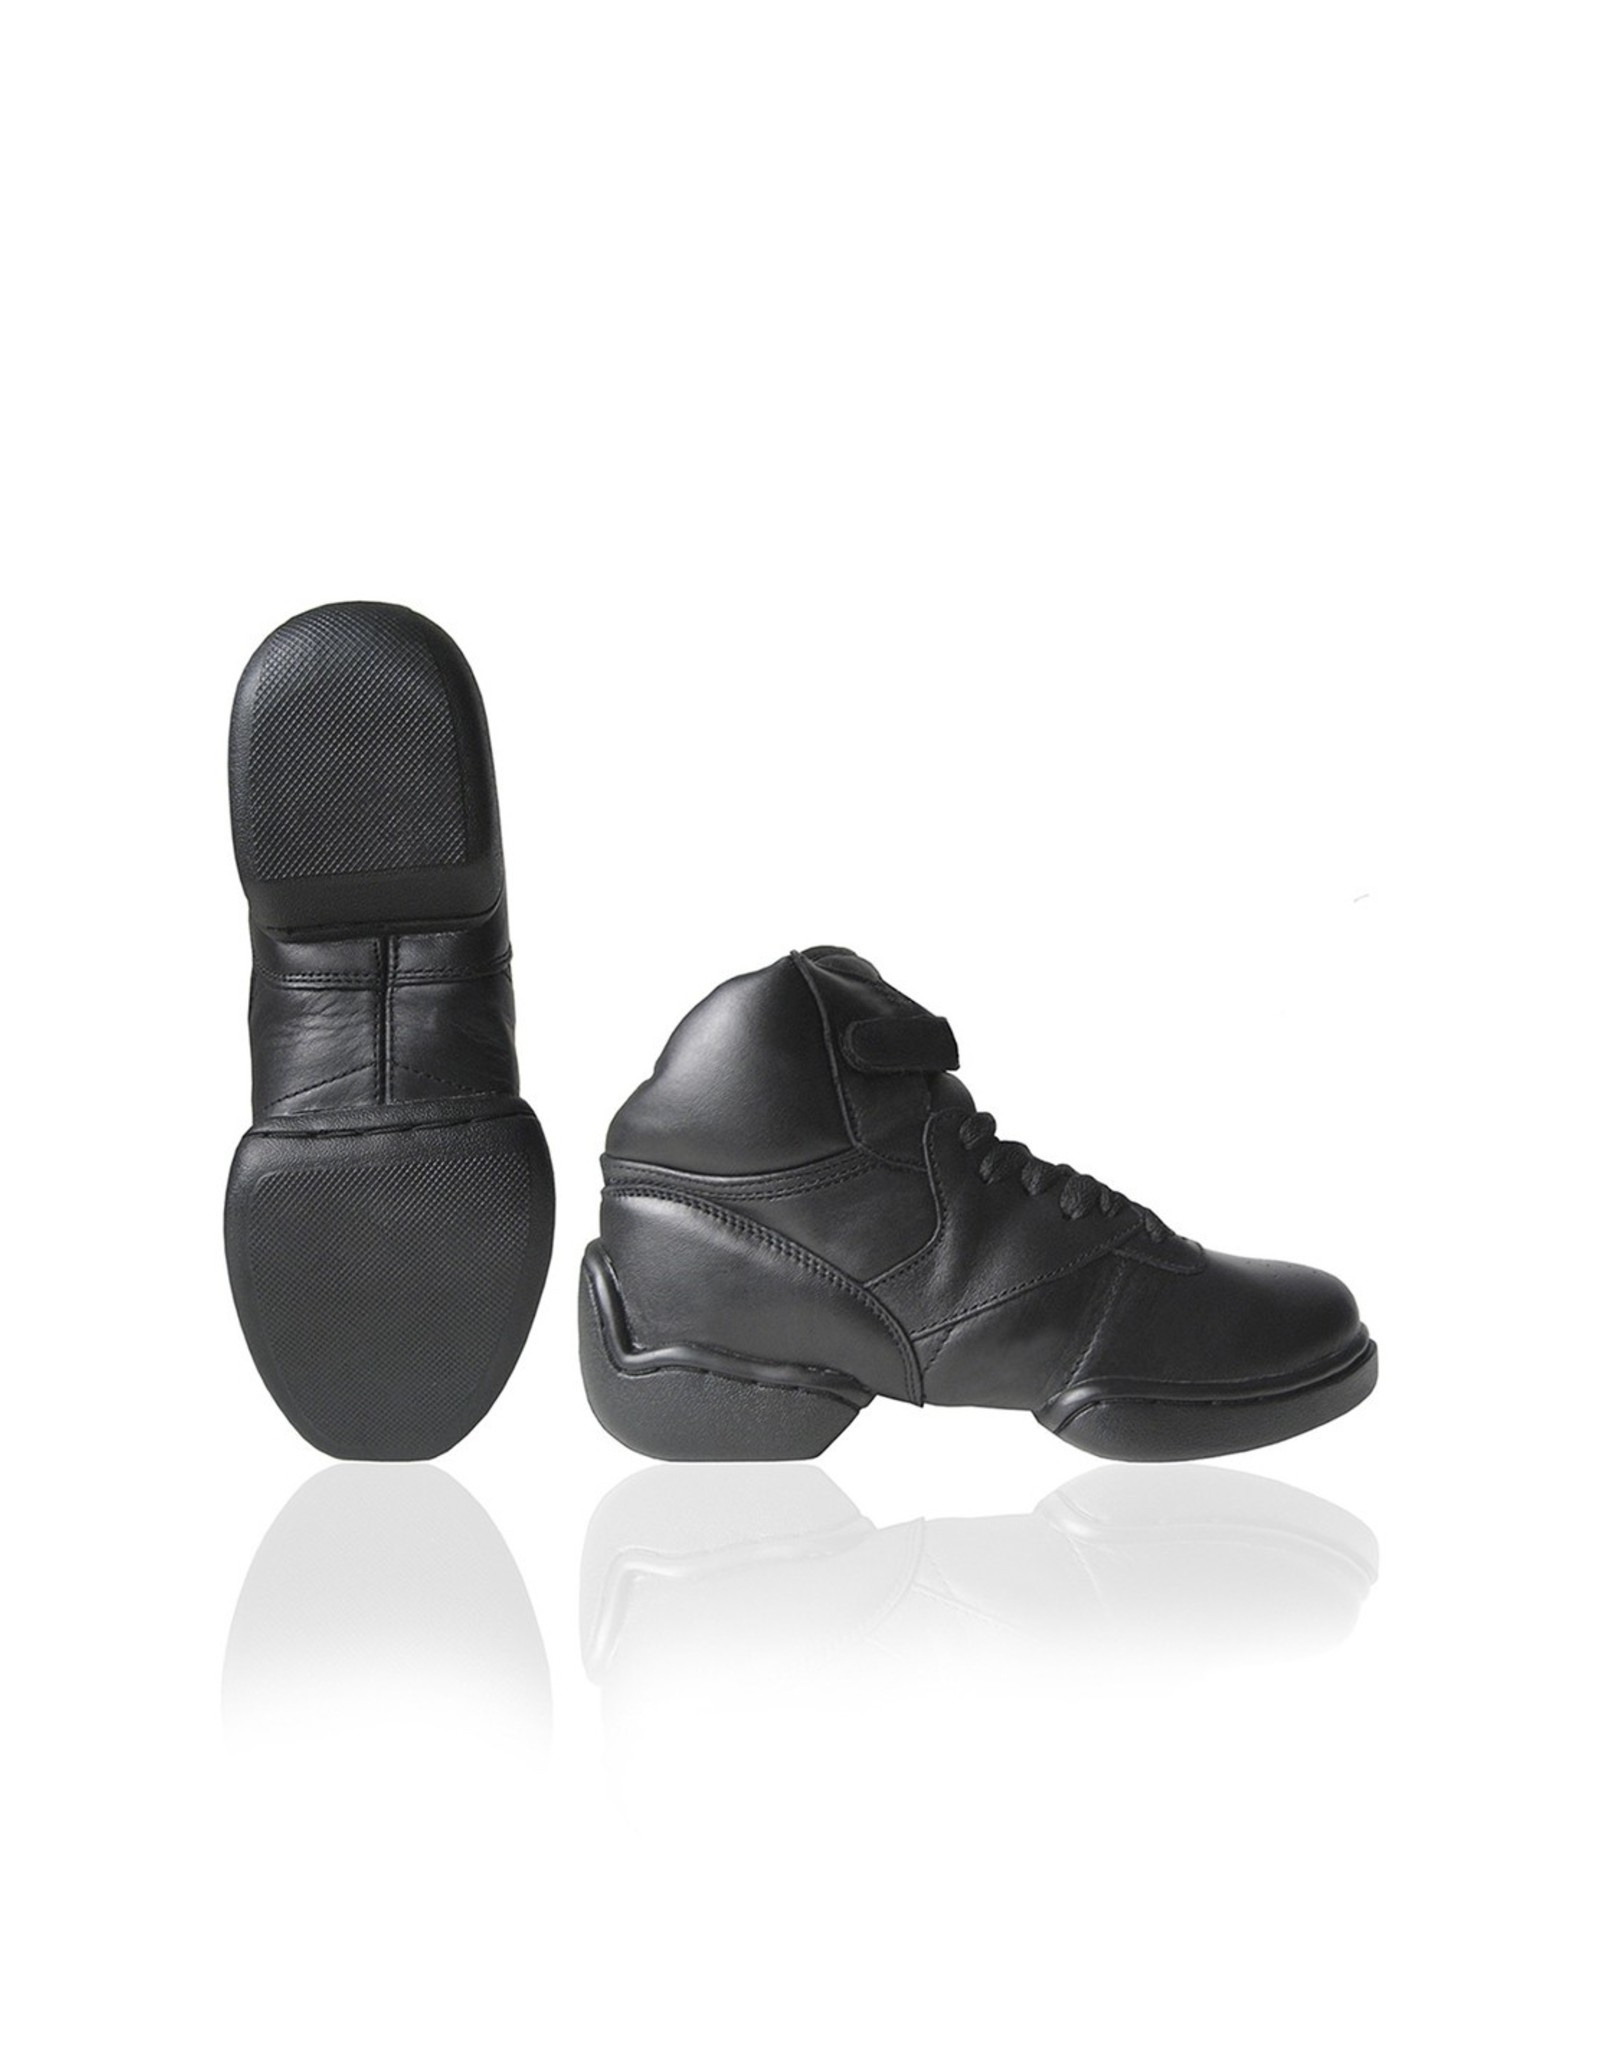 Papillon Dance sneaker, leather, split